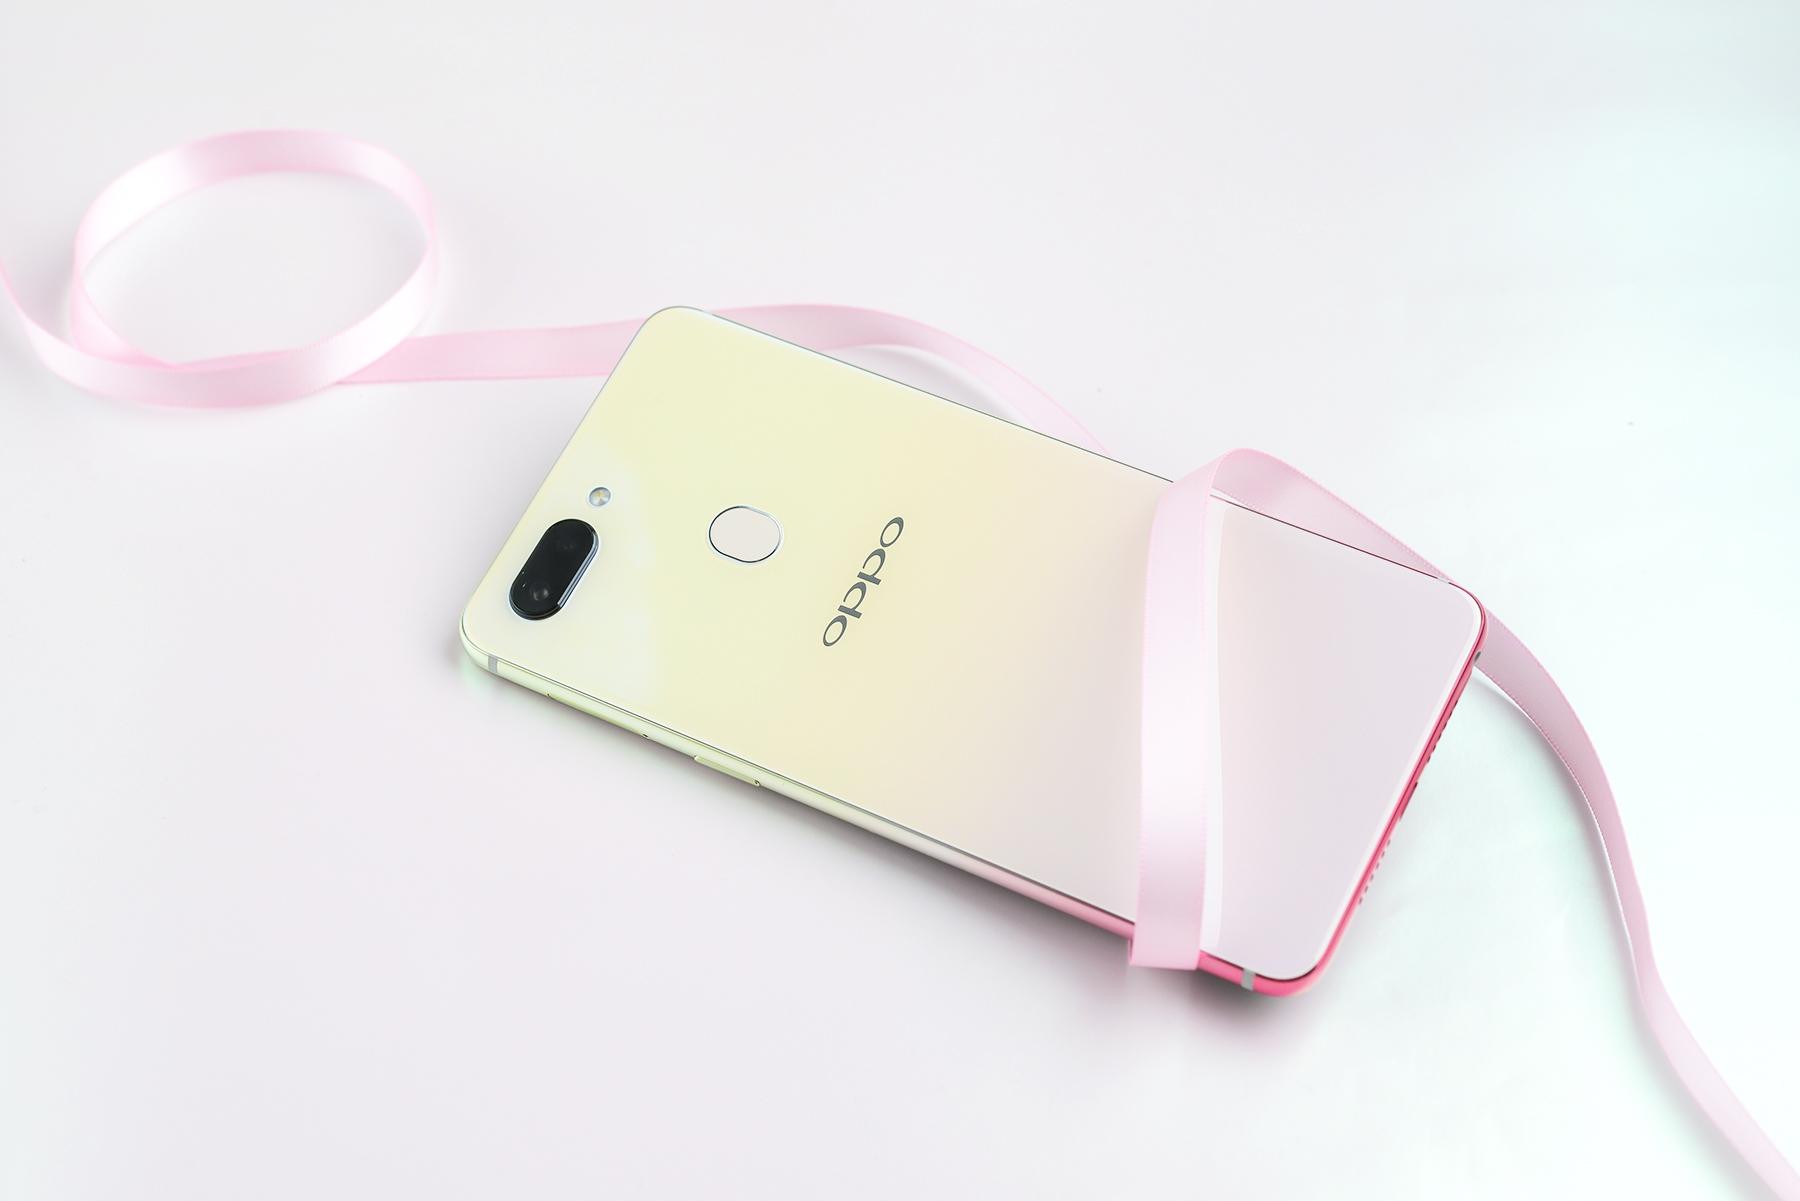 OPPO R15幻色粉开箱 不同光线下可呈现多变色彩